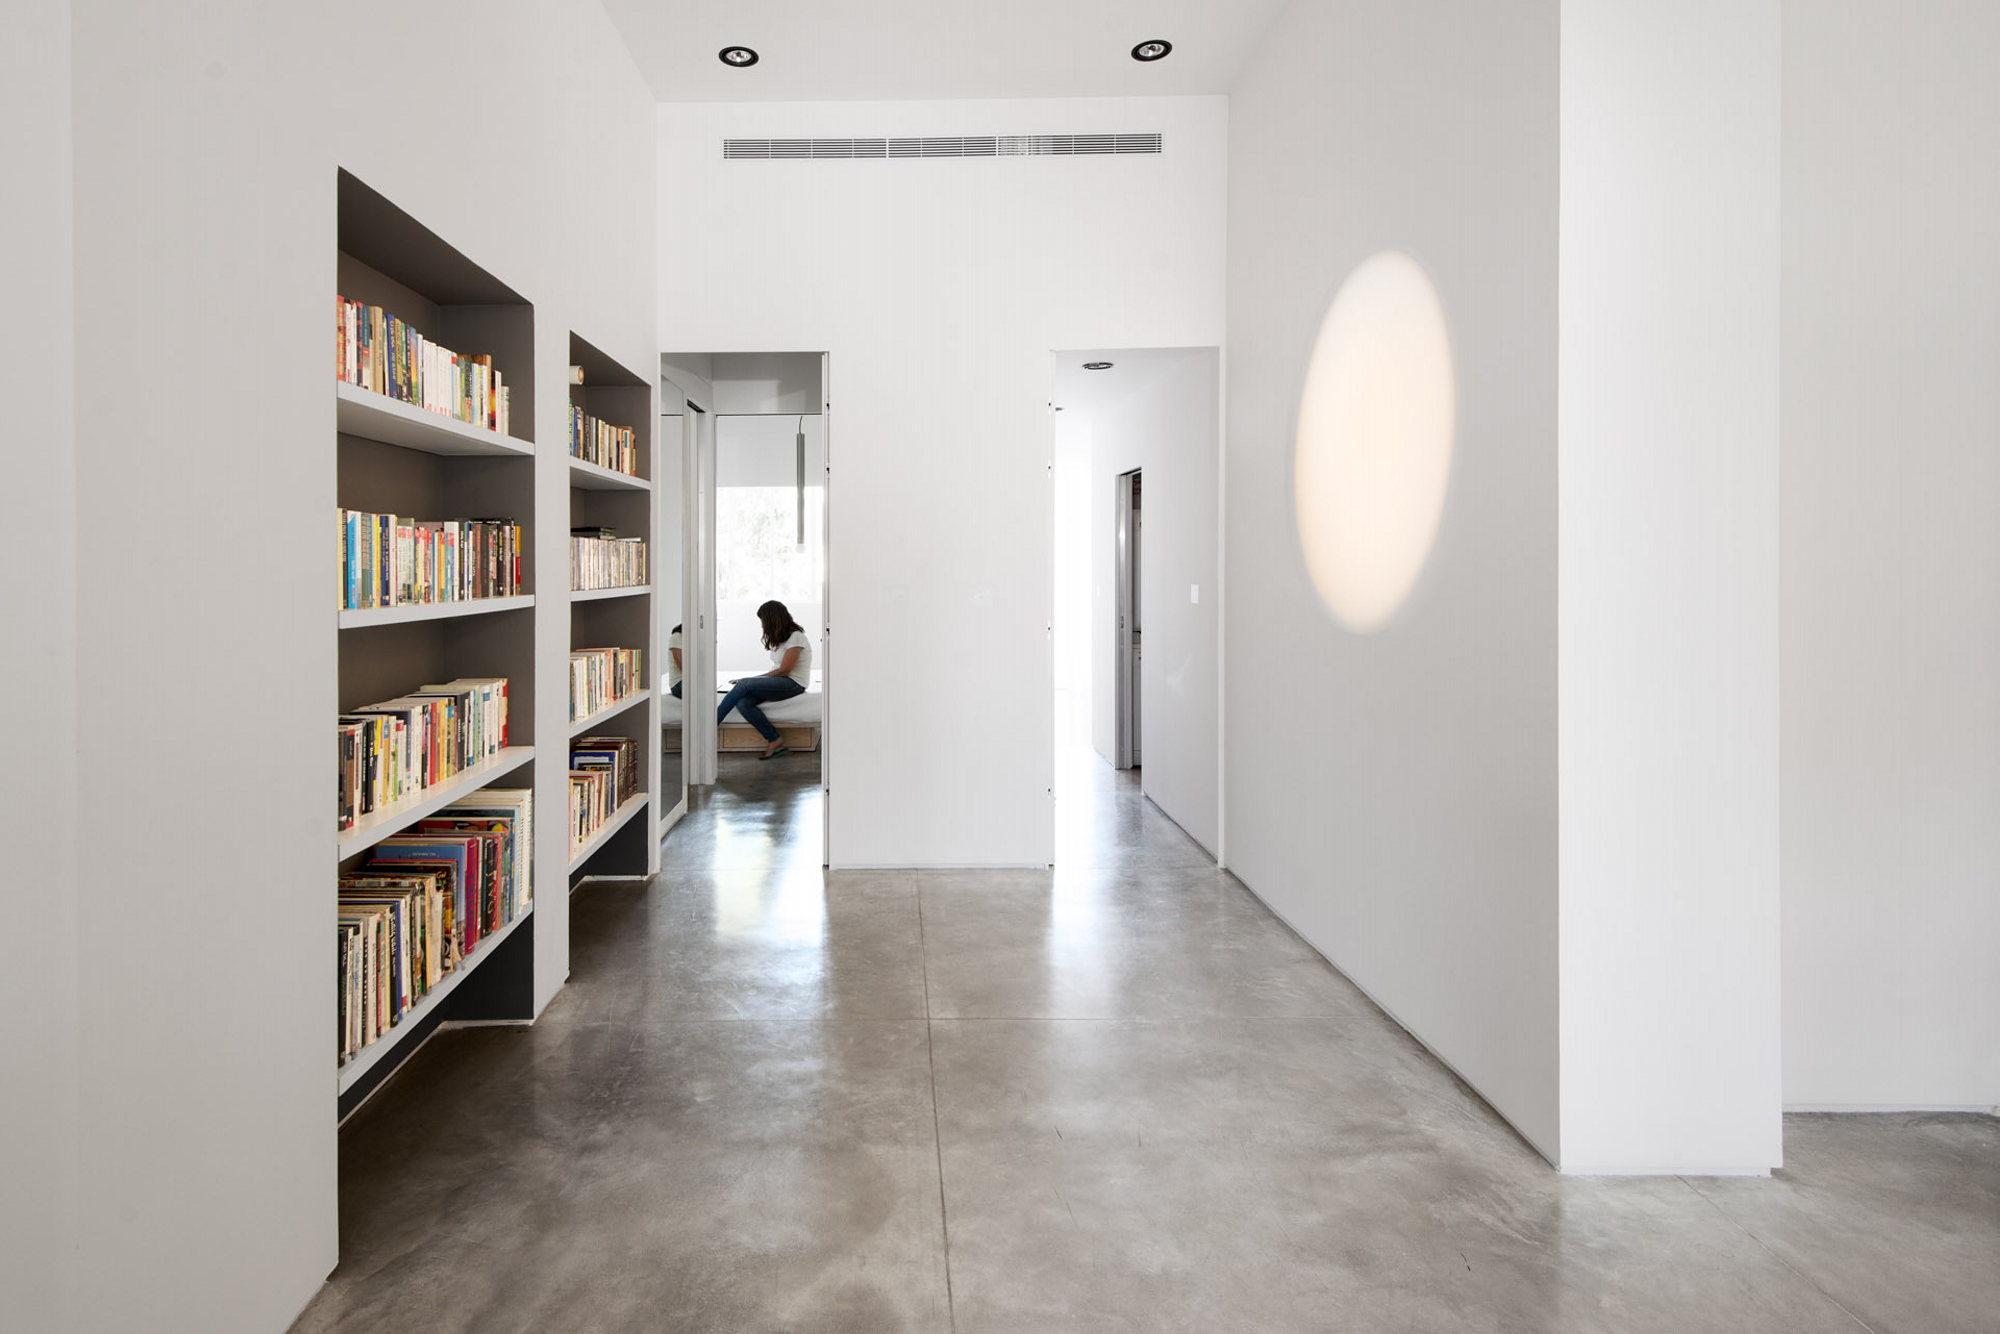 Gallery Of Cheap Apartments Tel Aviv Idea Three Bedroom Apartment In Tel Aviv By Chiara Ferrari Studio 3